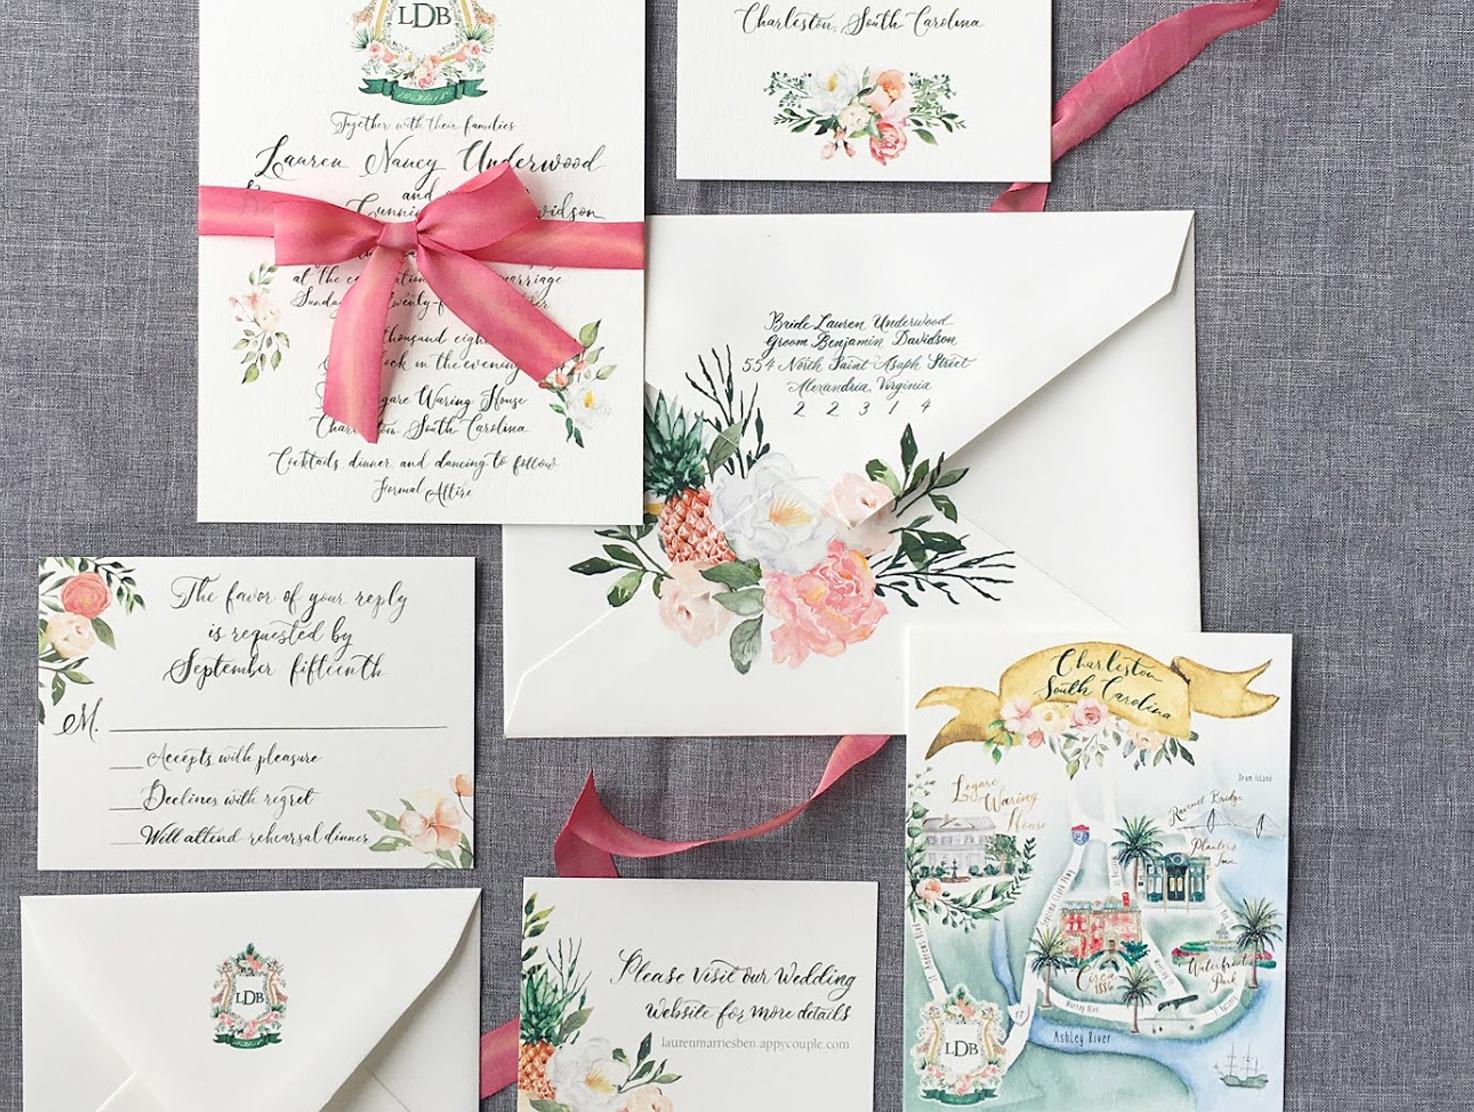 Charleston-southcarolina-weddinginvitation-mapdesign.jpg